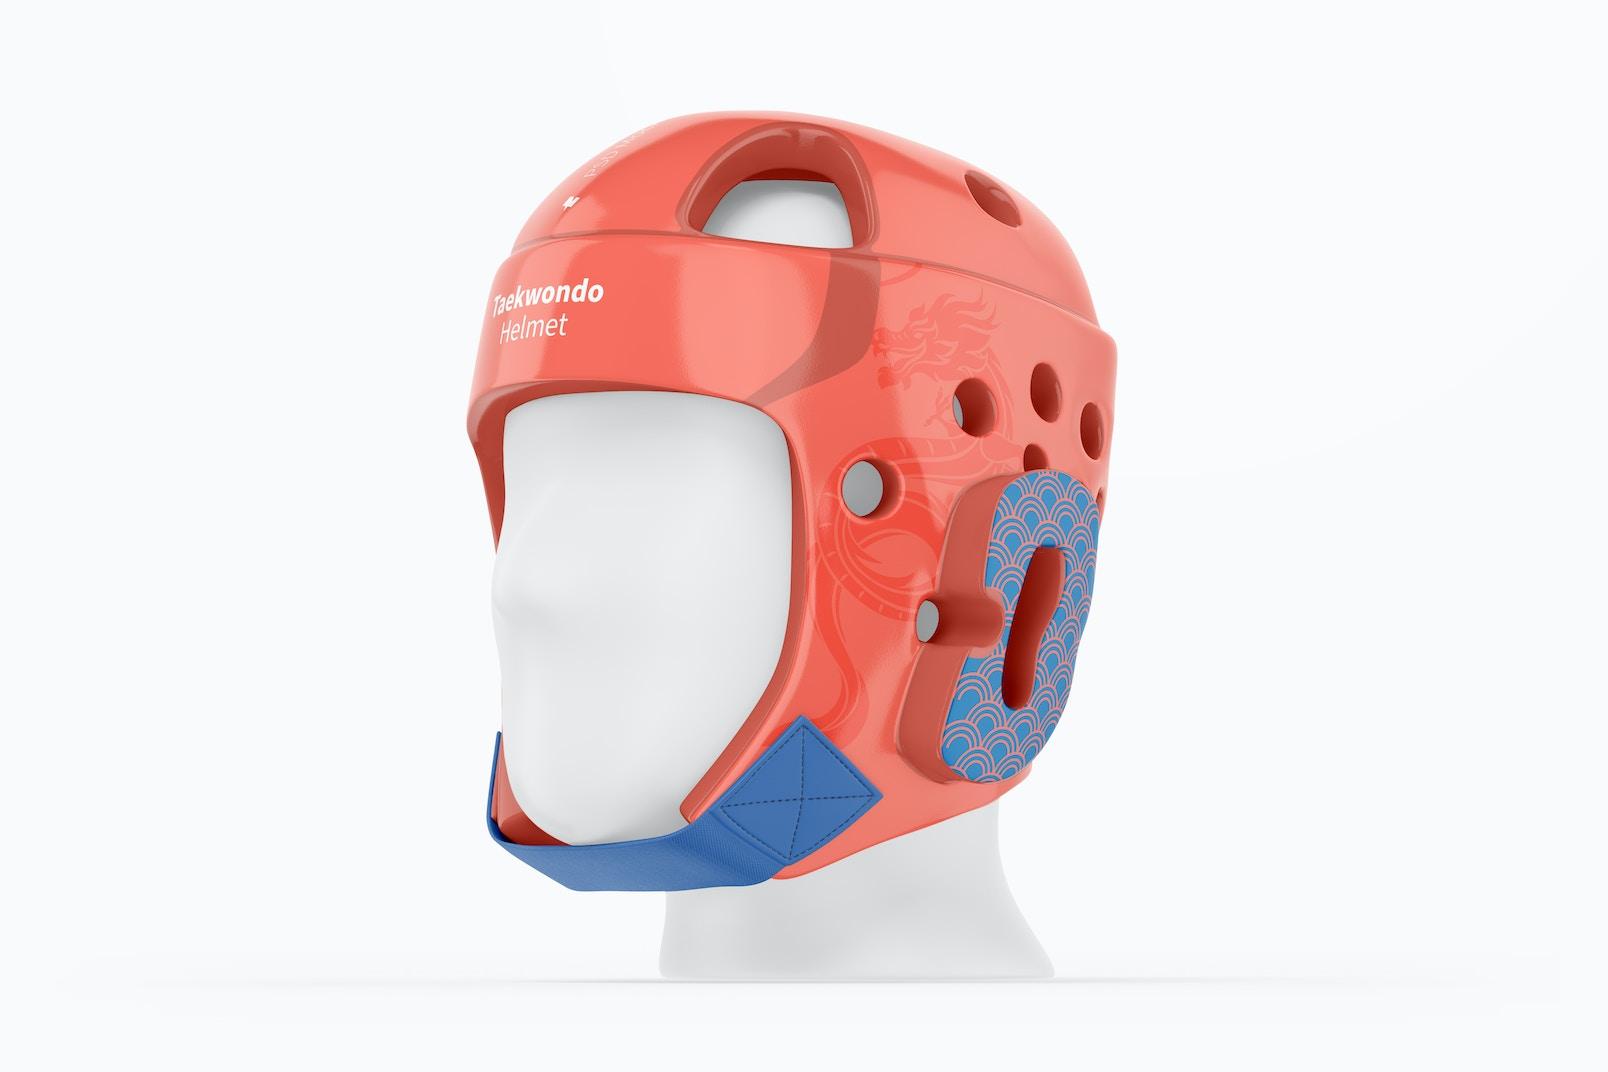 Taekwondo Helmet Mockup, Right View